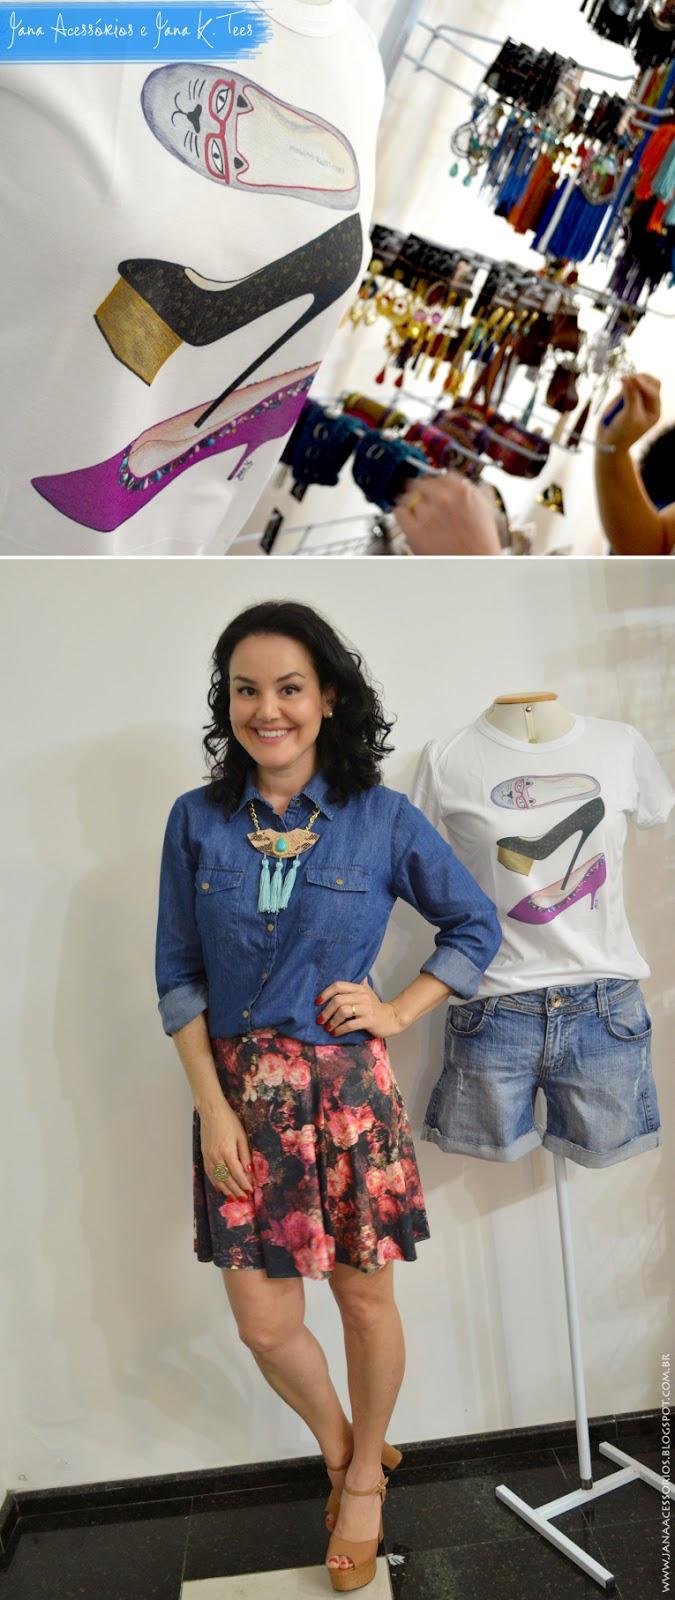 Blog da Jana, Joinville, Acessórios, Blog de acessórios, blogueira, ,blogger, jana acessórios, jana k. tees, artesanato, design, Jana Acessórios e Jana K. Tees